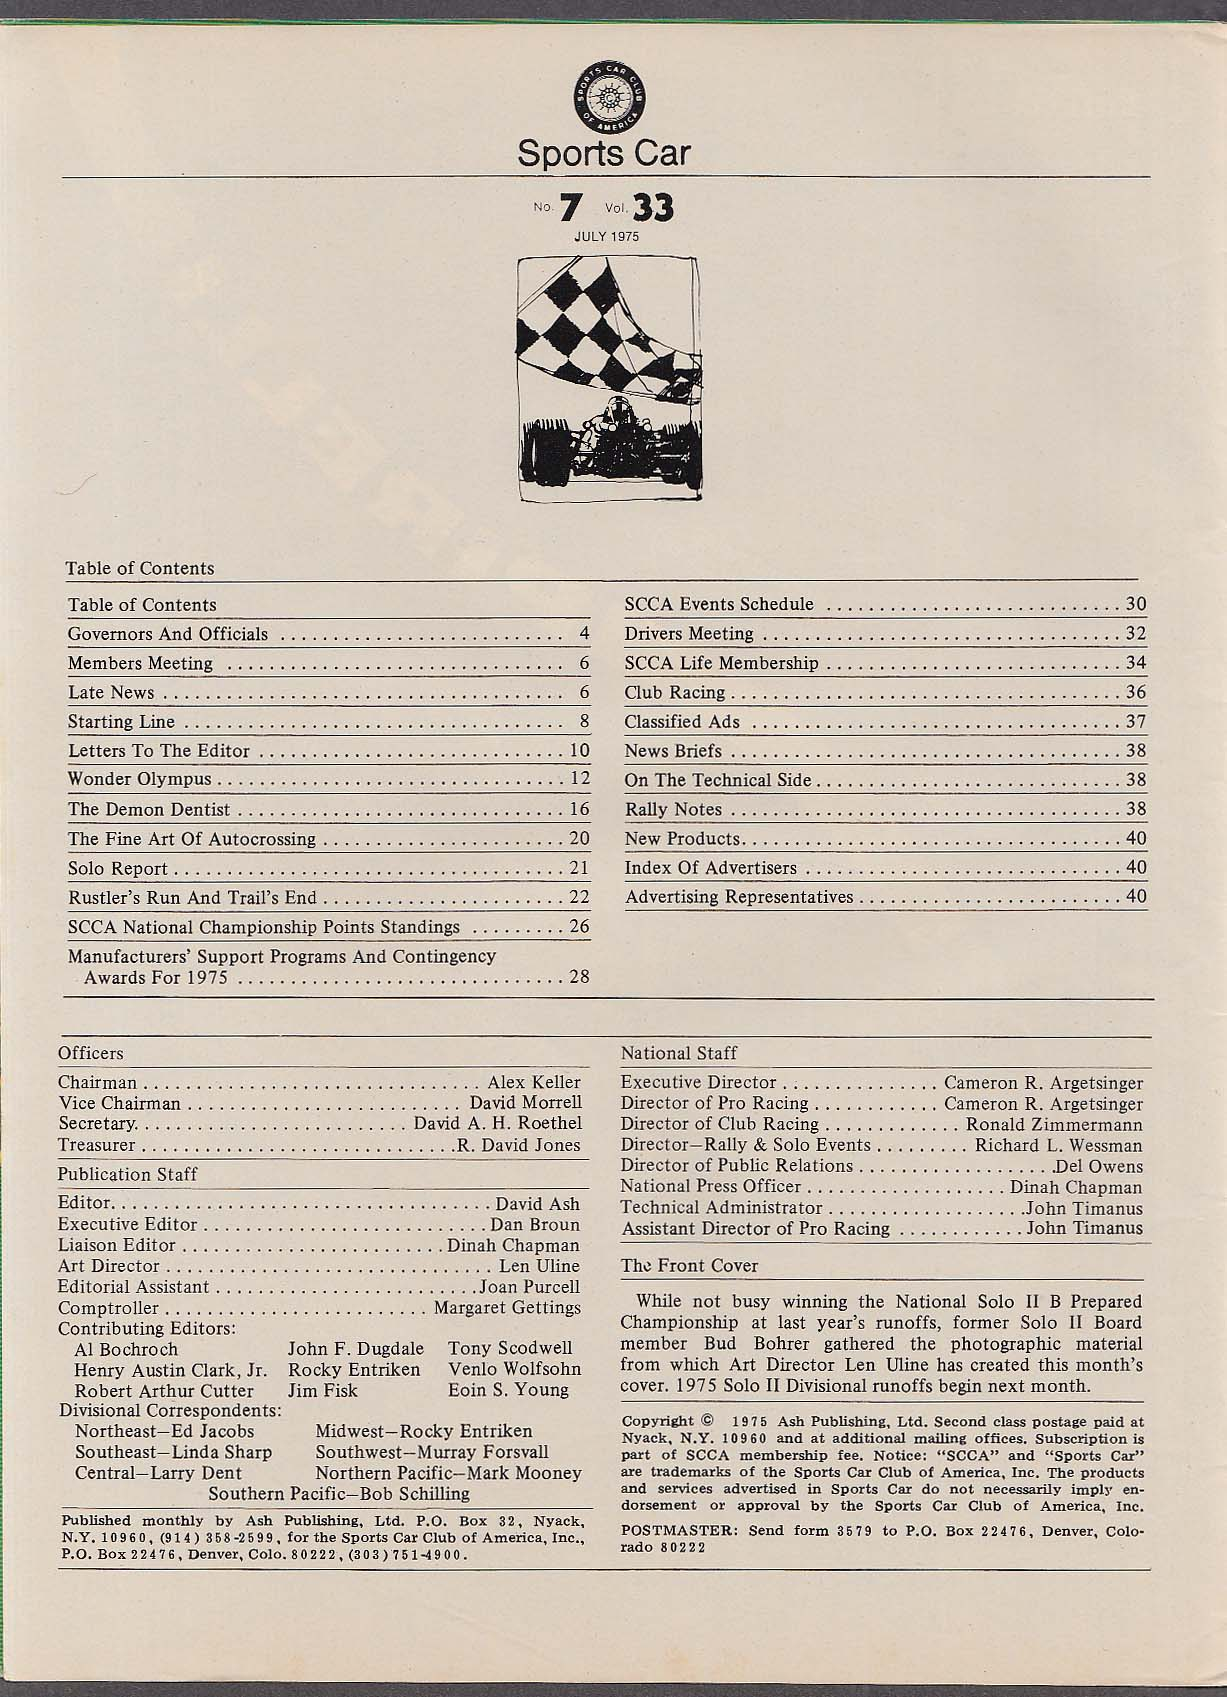 SCCA SPORTS CAR Wonder Olympus John Buffum Bill Schmid ++ 7 1975